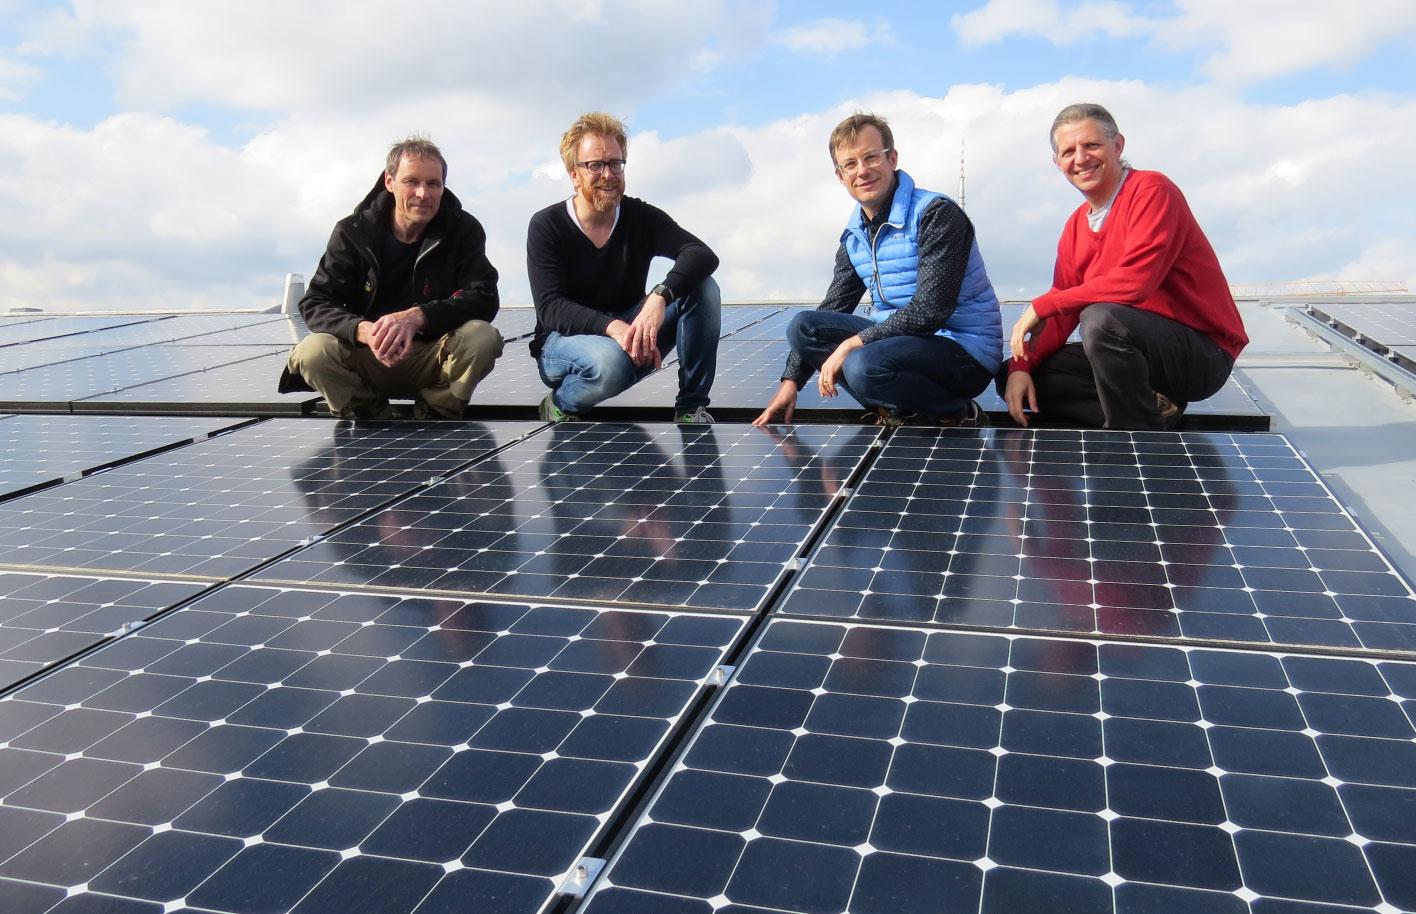 Abnahme der PV-Anlage am 6.4.2016. (v. l. n. r.: Stefan Hauser (Hauser Solartechnik GmbH), Andreas Leonhard (Geschäftsführer der Betreiber GbR), Christian Pletl (GbR-Gesellschafter), Dr. Andreas Horn (Energiewendeplaner GmbH)